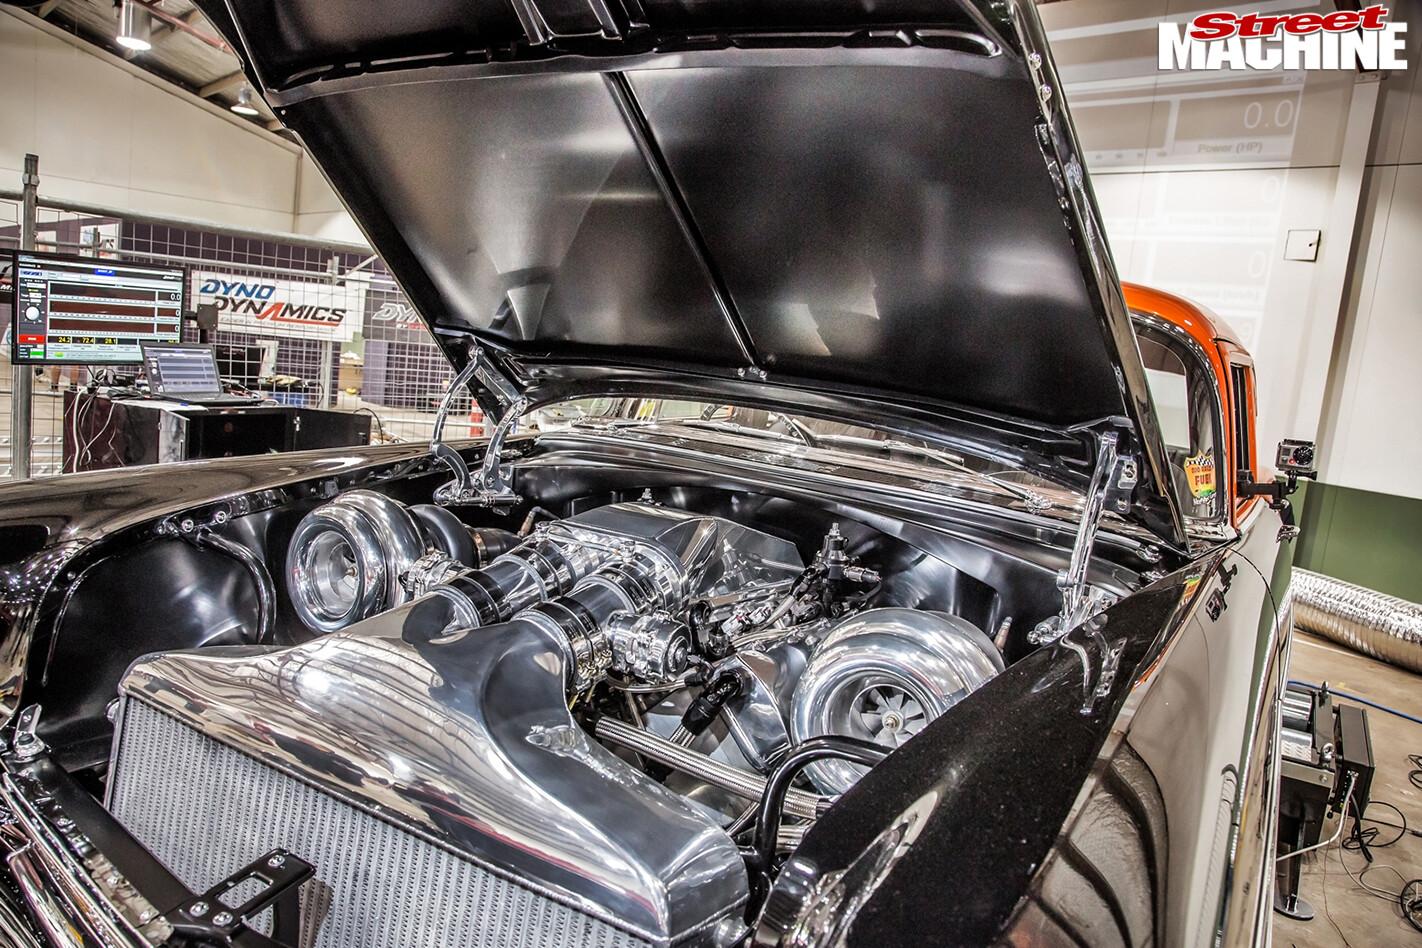 Chevrolet -engine